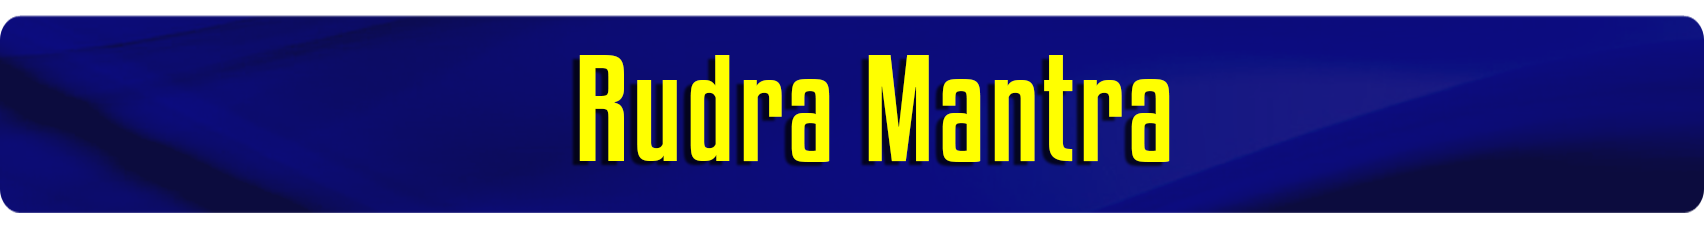 Rudra Moola Mantra